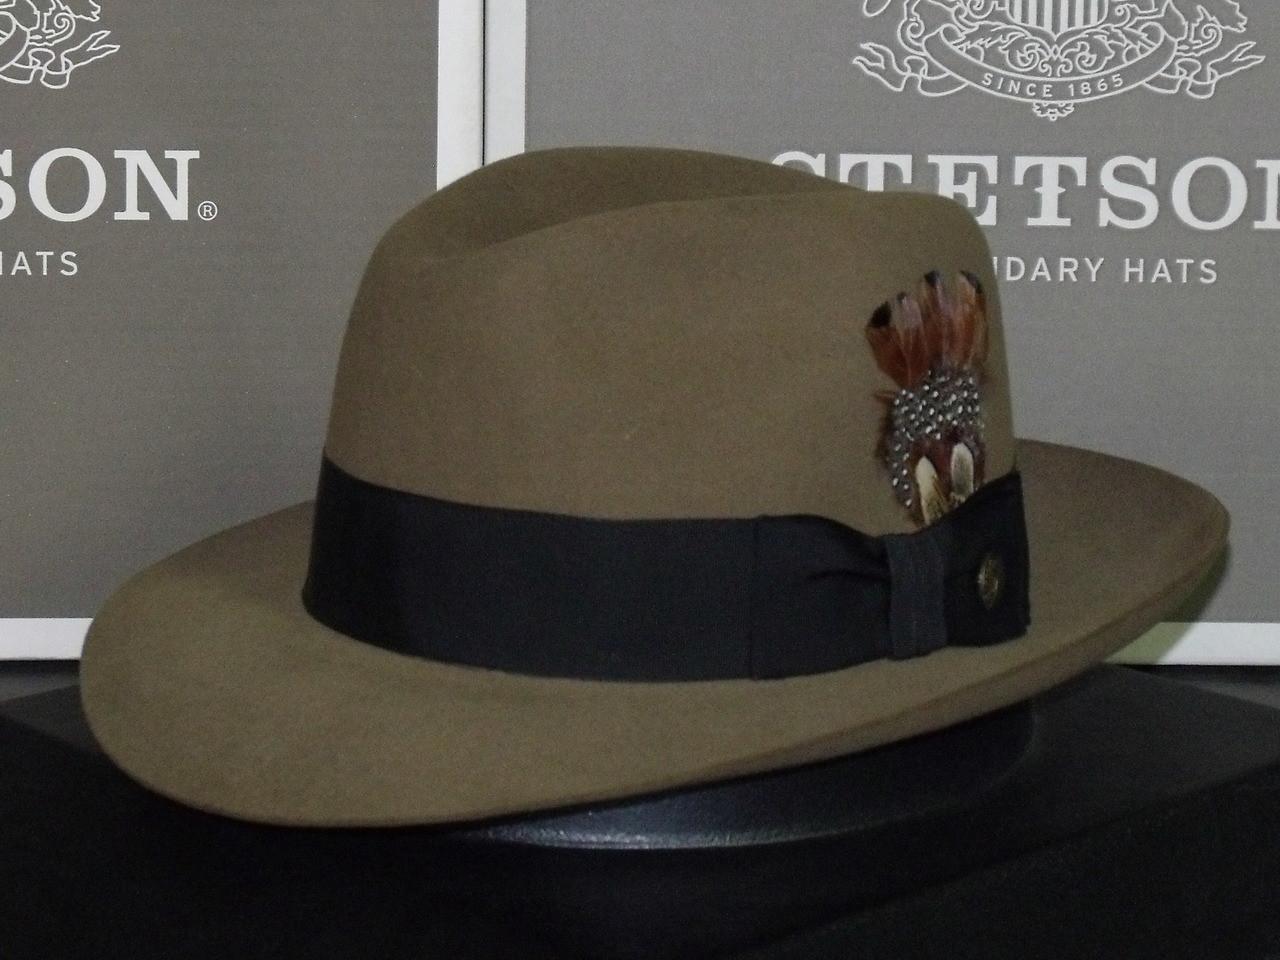 fac2193fc3e4a Stetson Temple Fur Felt Indiana Jones Fedora Hat - One 2 mini Ranch